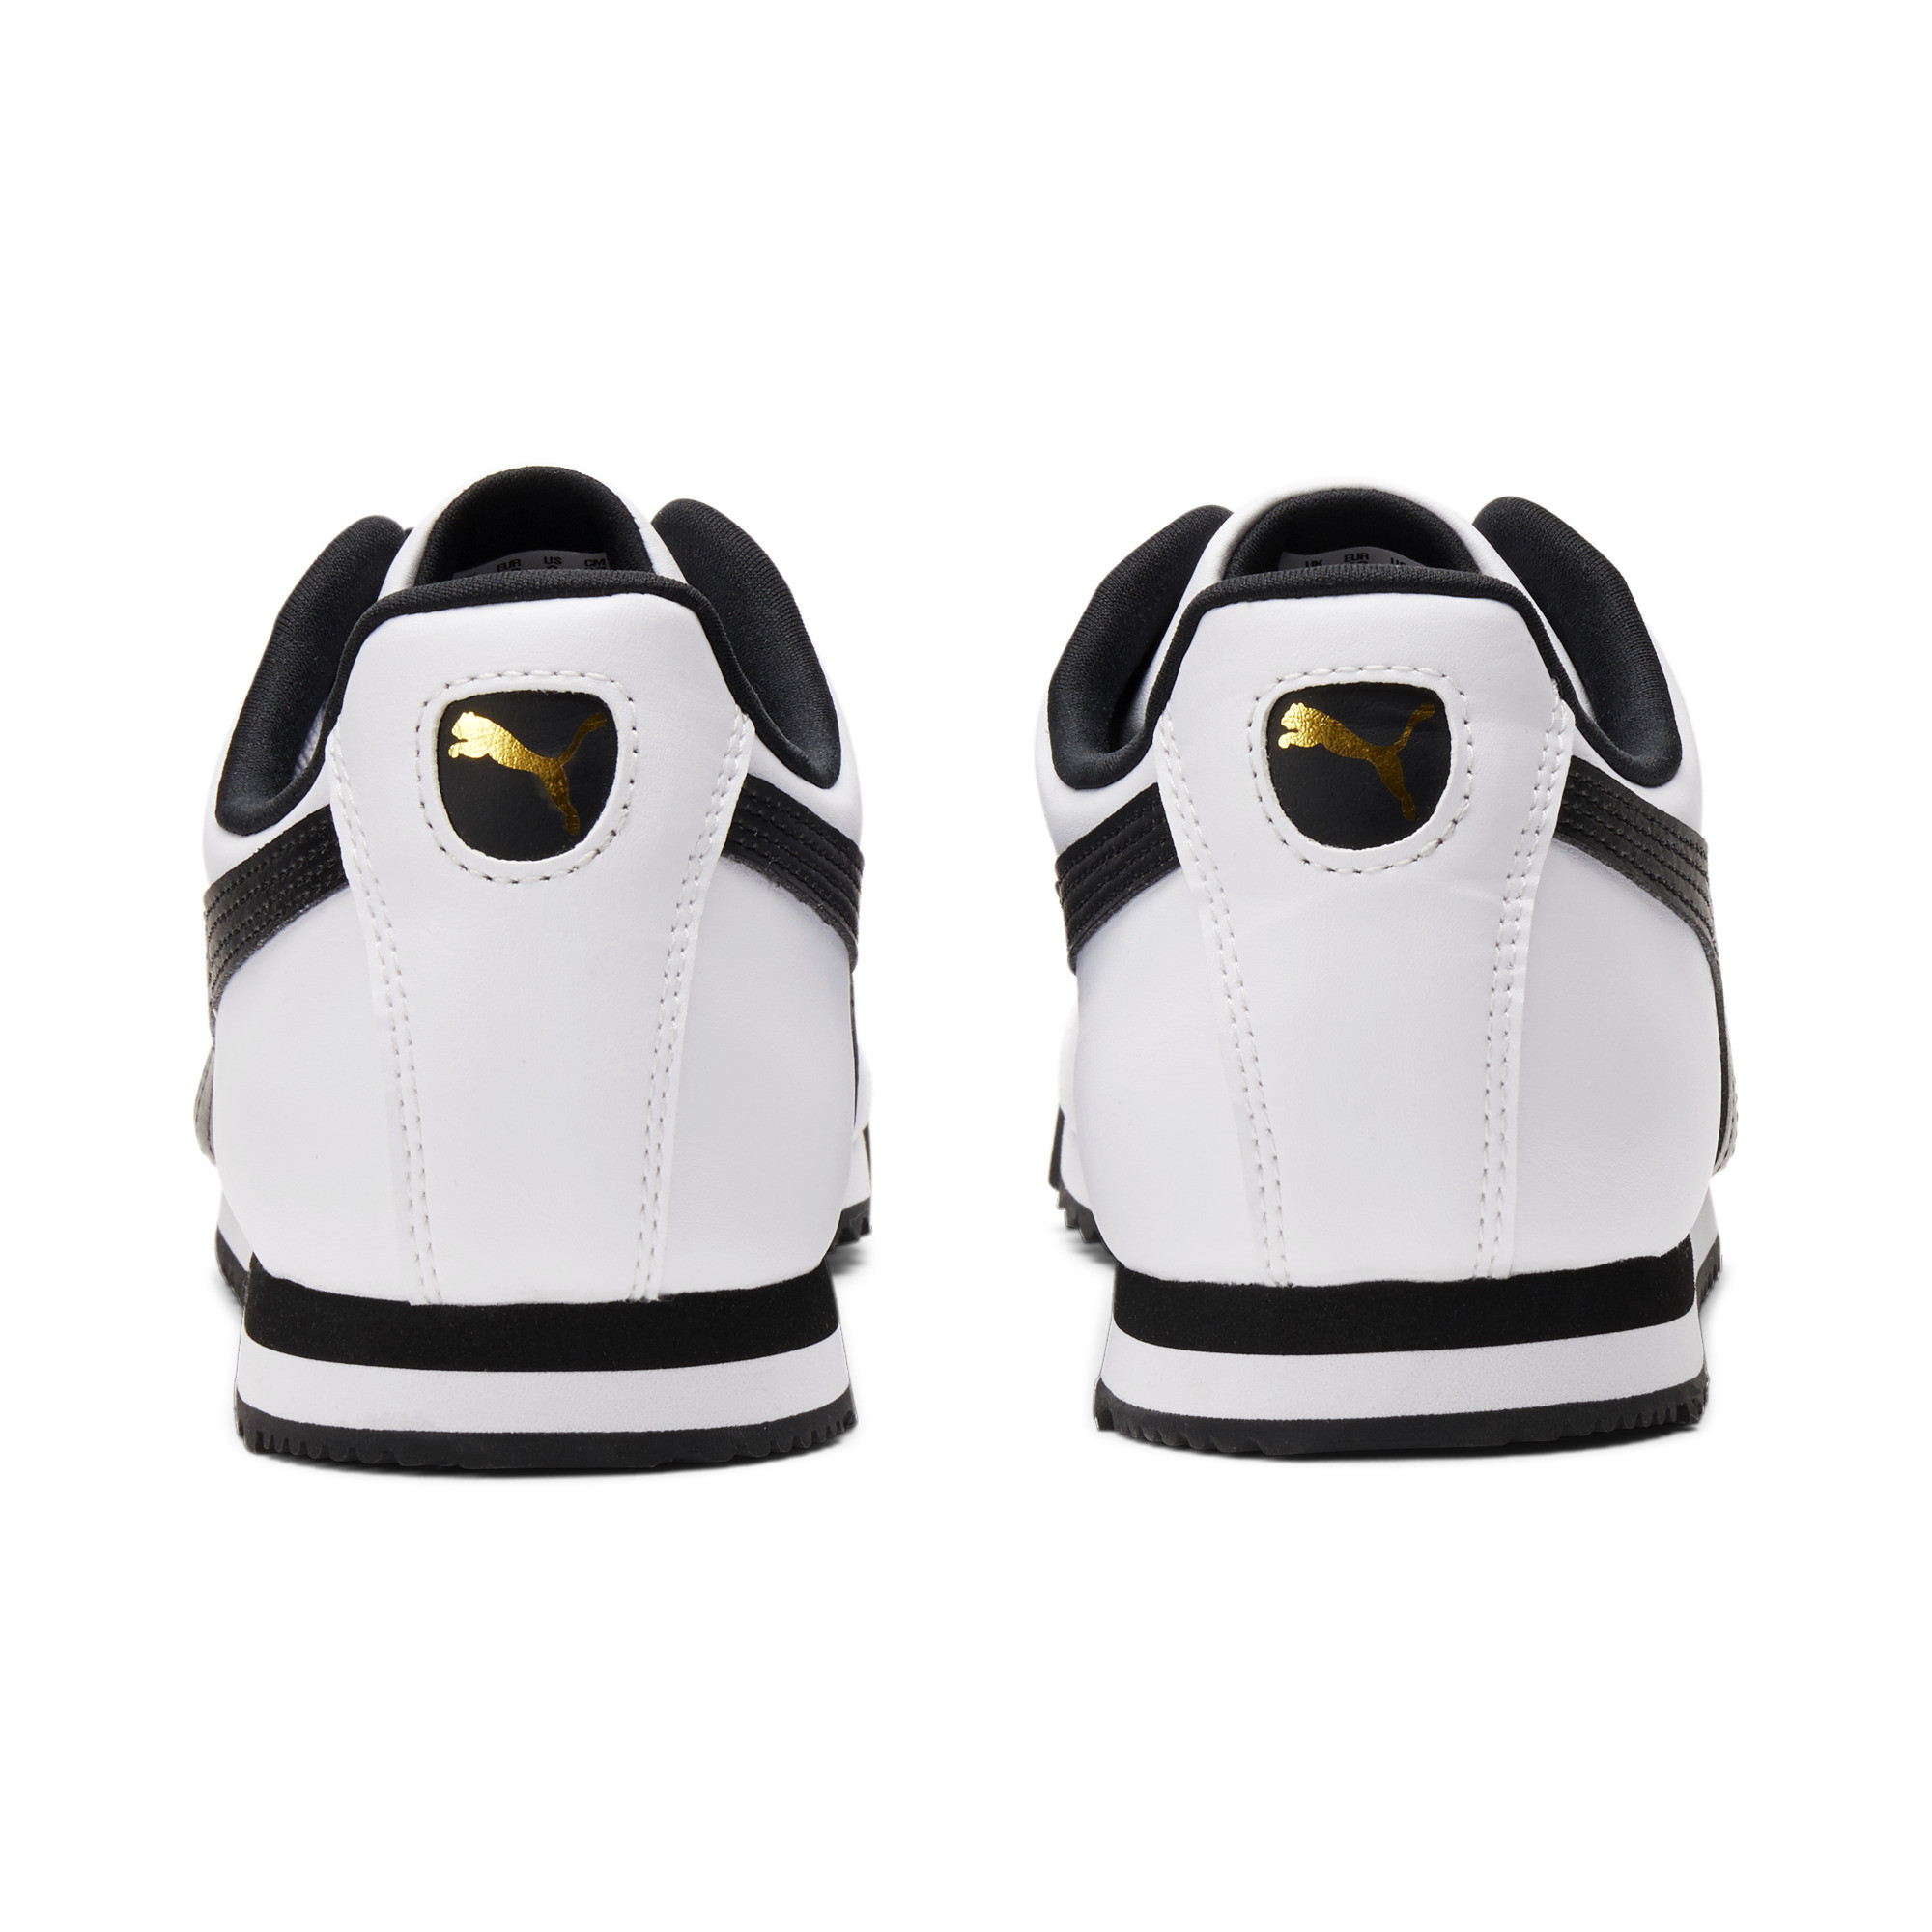 miniature 11 - Puma Men's Roma Basic Sneakers